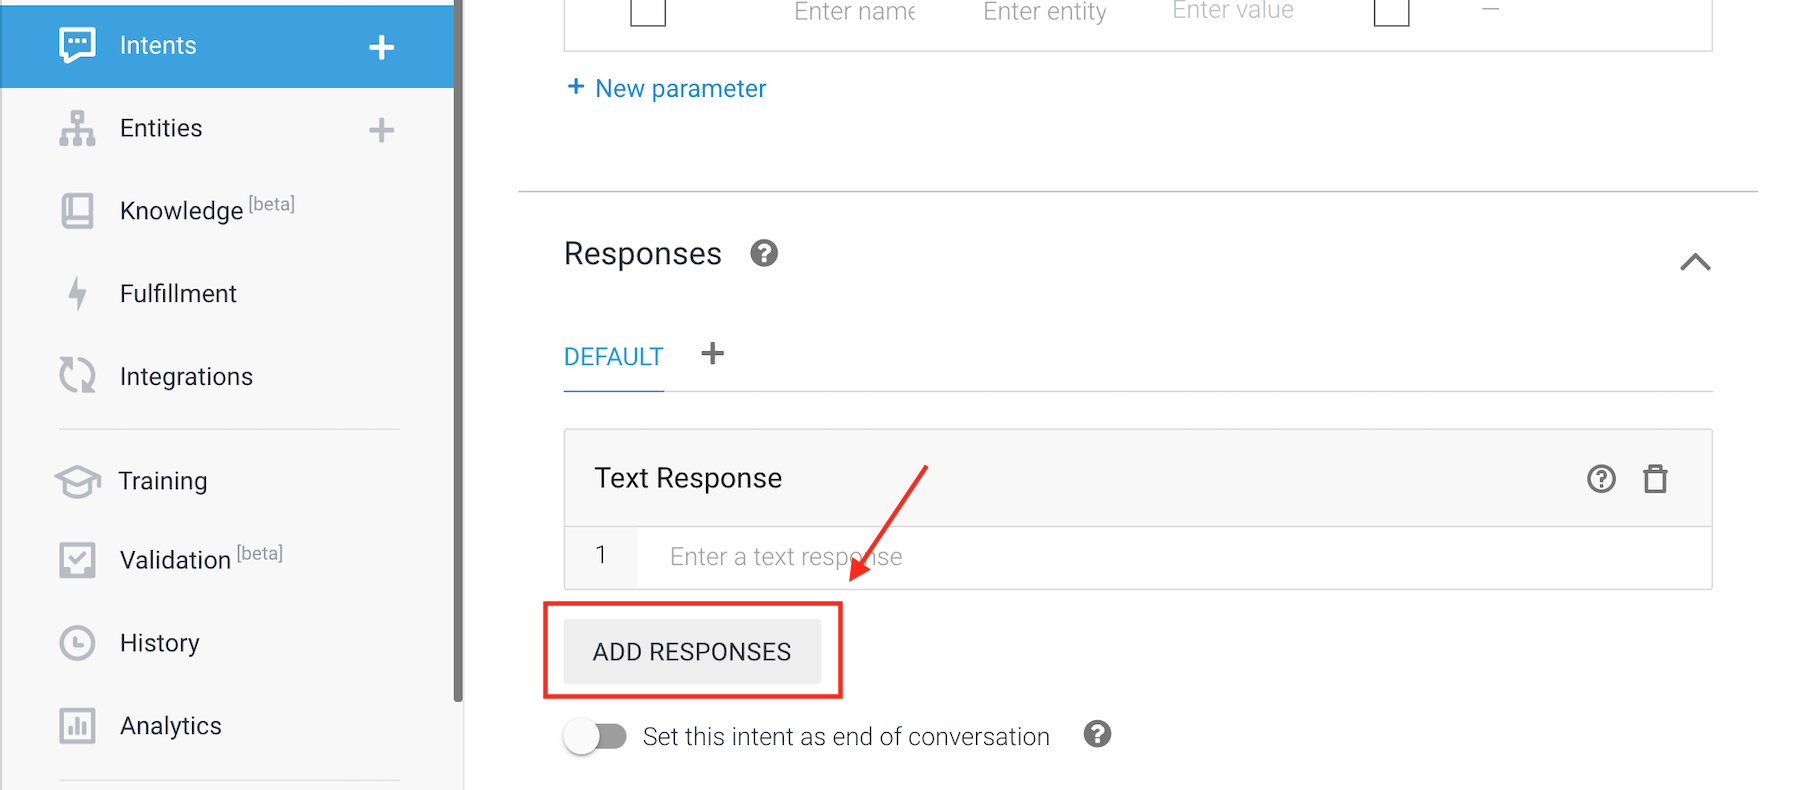 Add Responses in Dialogflow